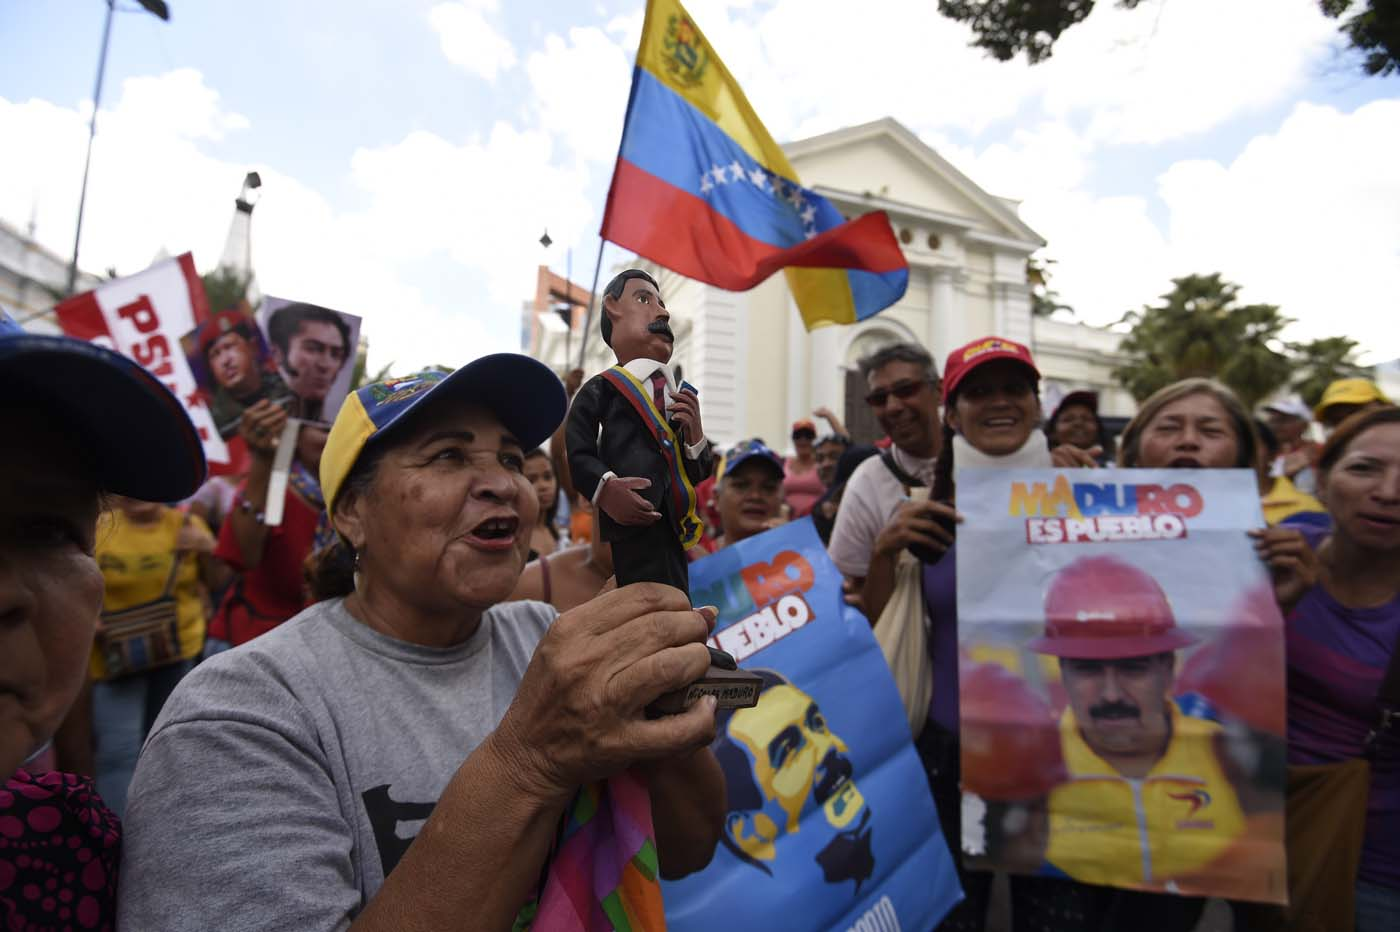 Gobierno de Nicolas Maduro. - Página 18 000_HF2QW